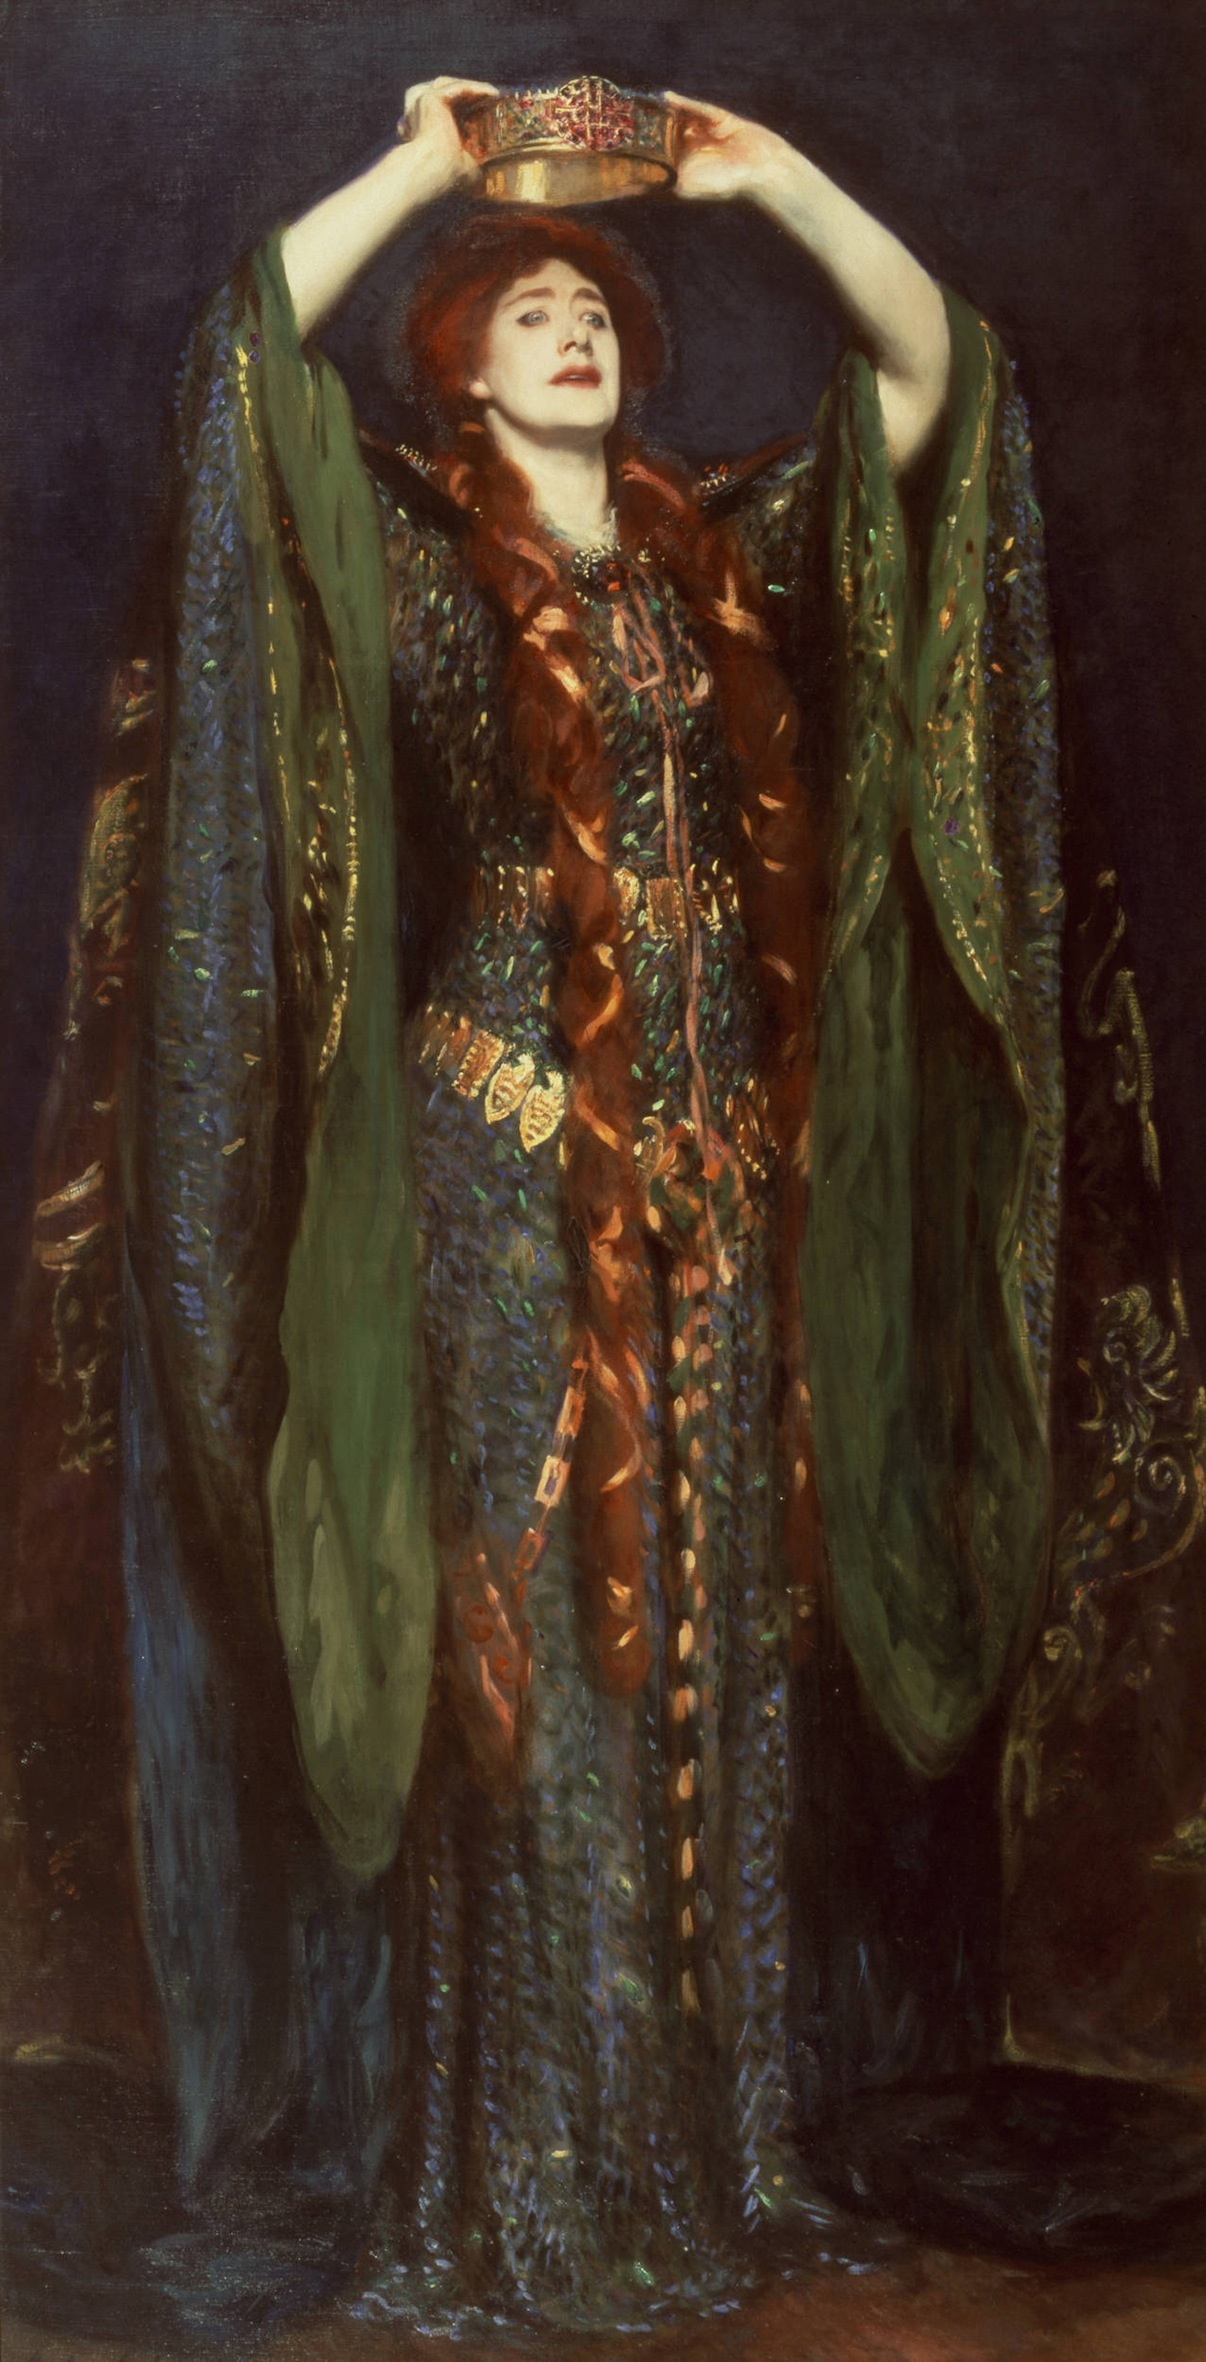 'Ellen Terry as Lady Macbeth' at Tate Britain